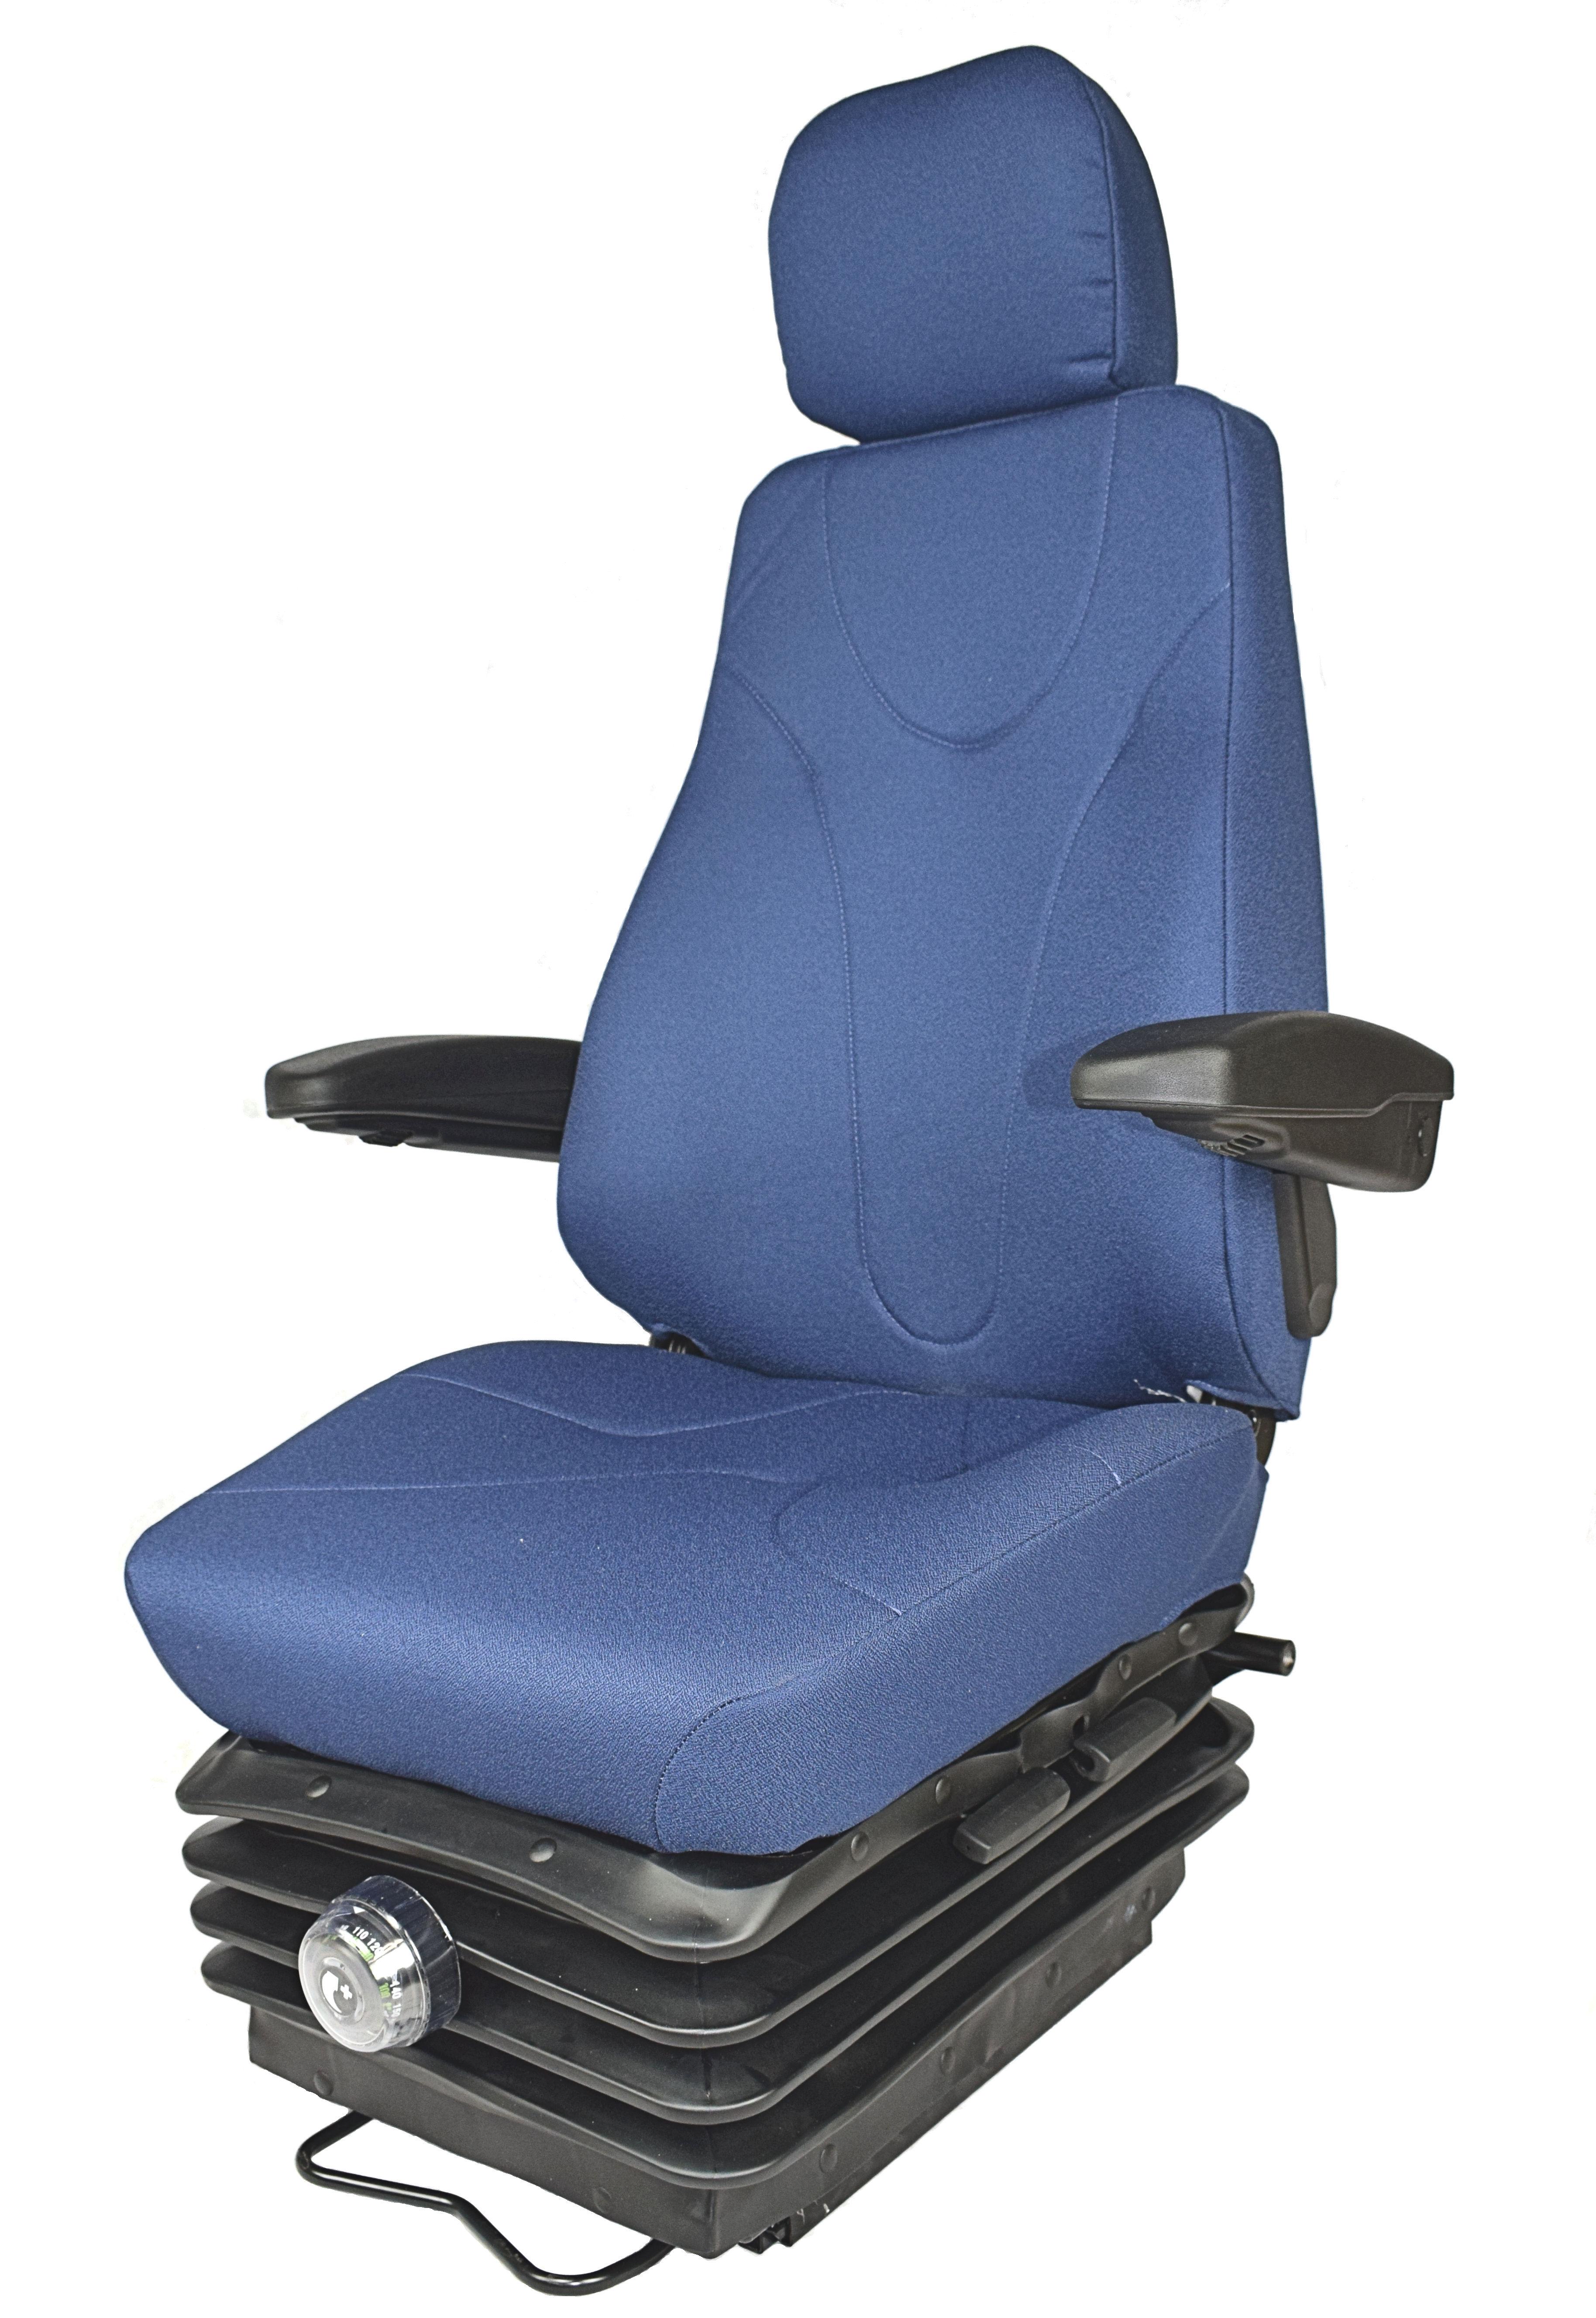 KAB Seating 36 Marine Helm Captain chair Heavy Duty Seats